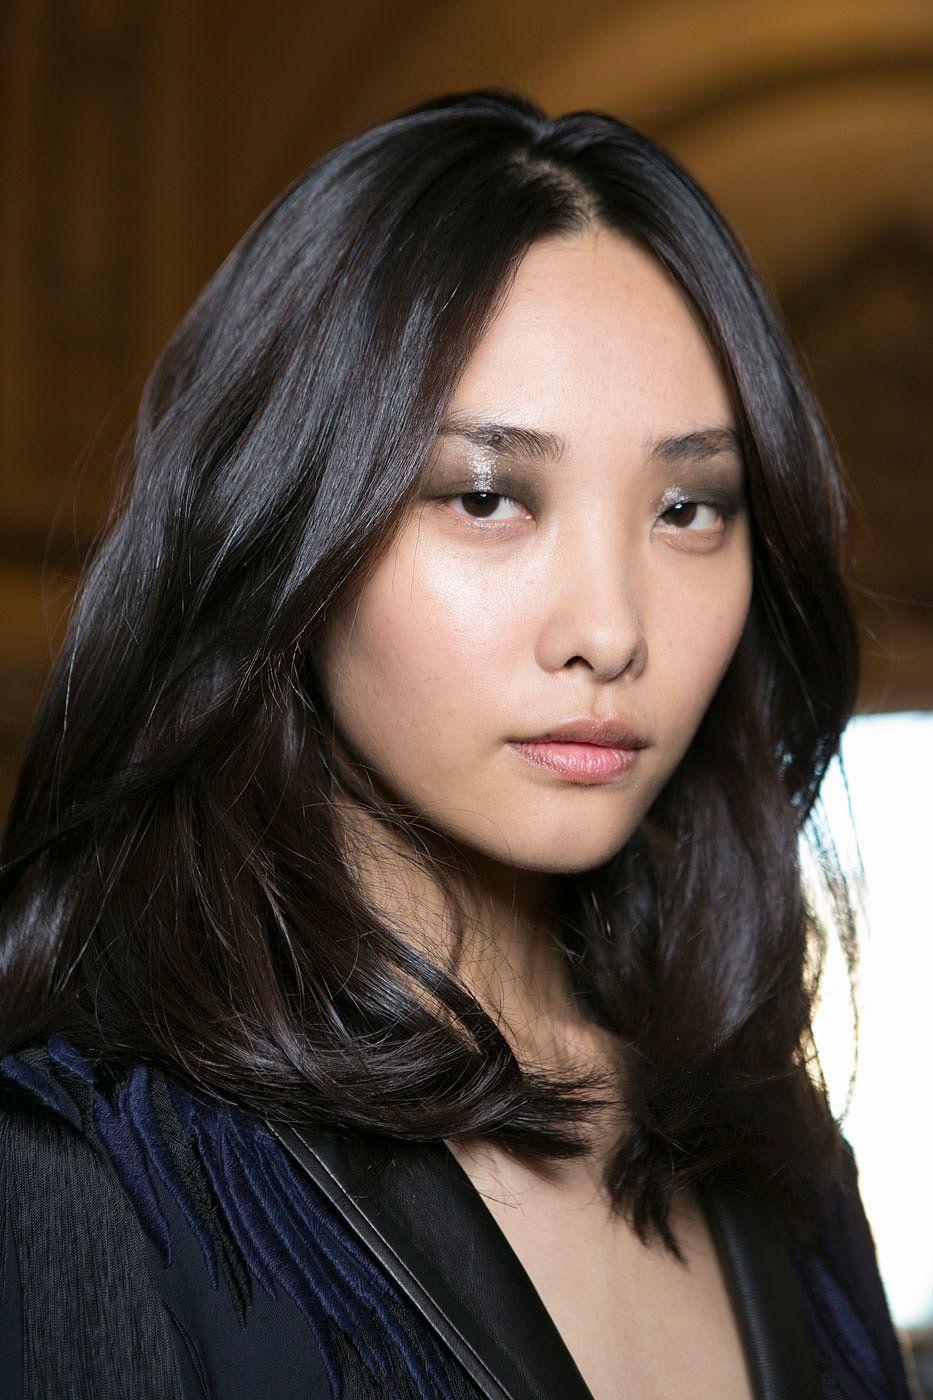 Barbara bui spring makeup hair style and beauty photos